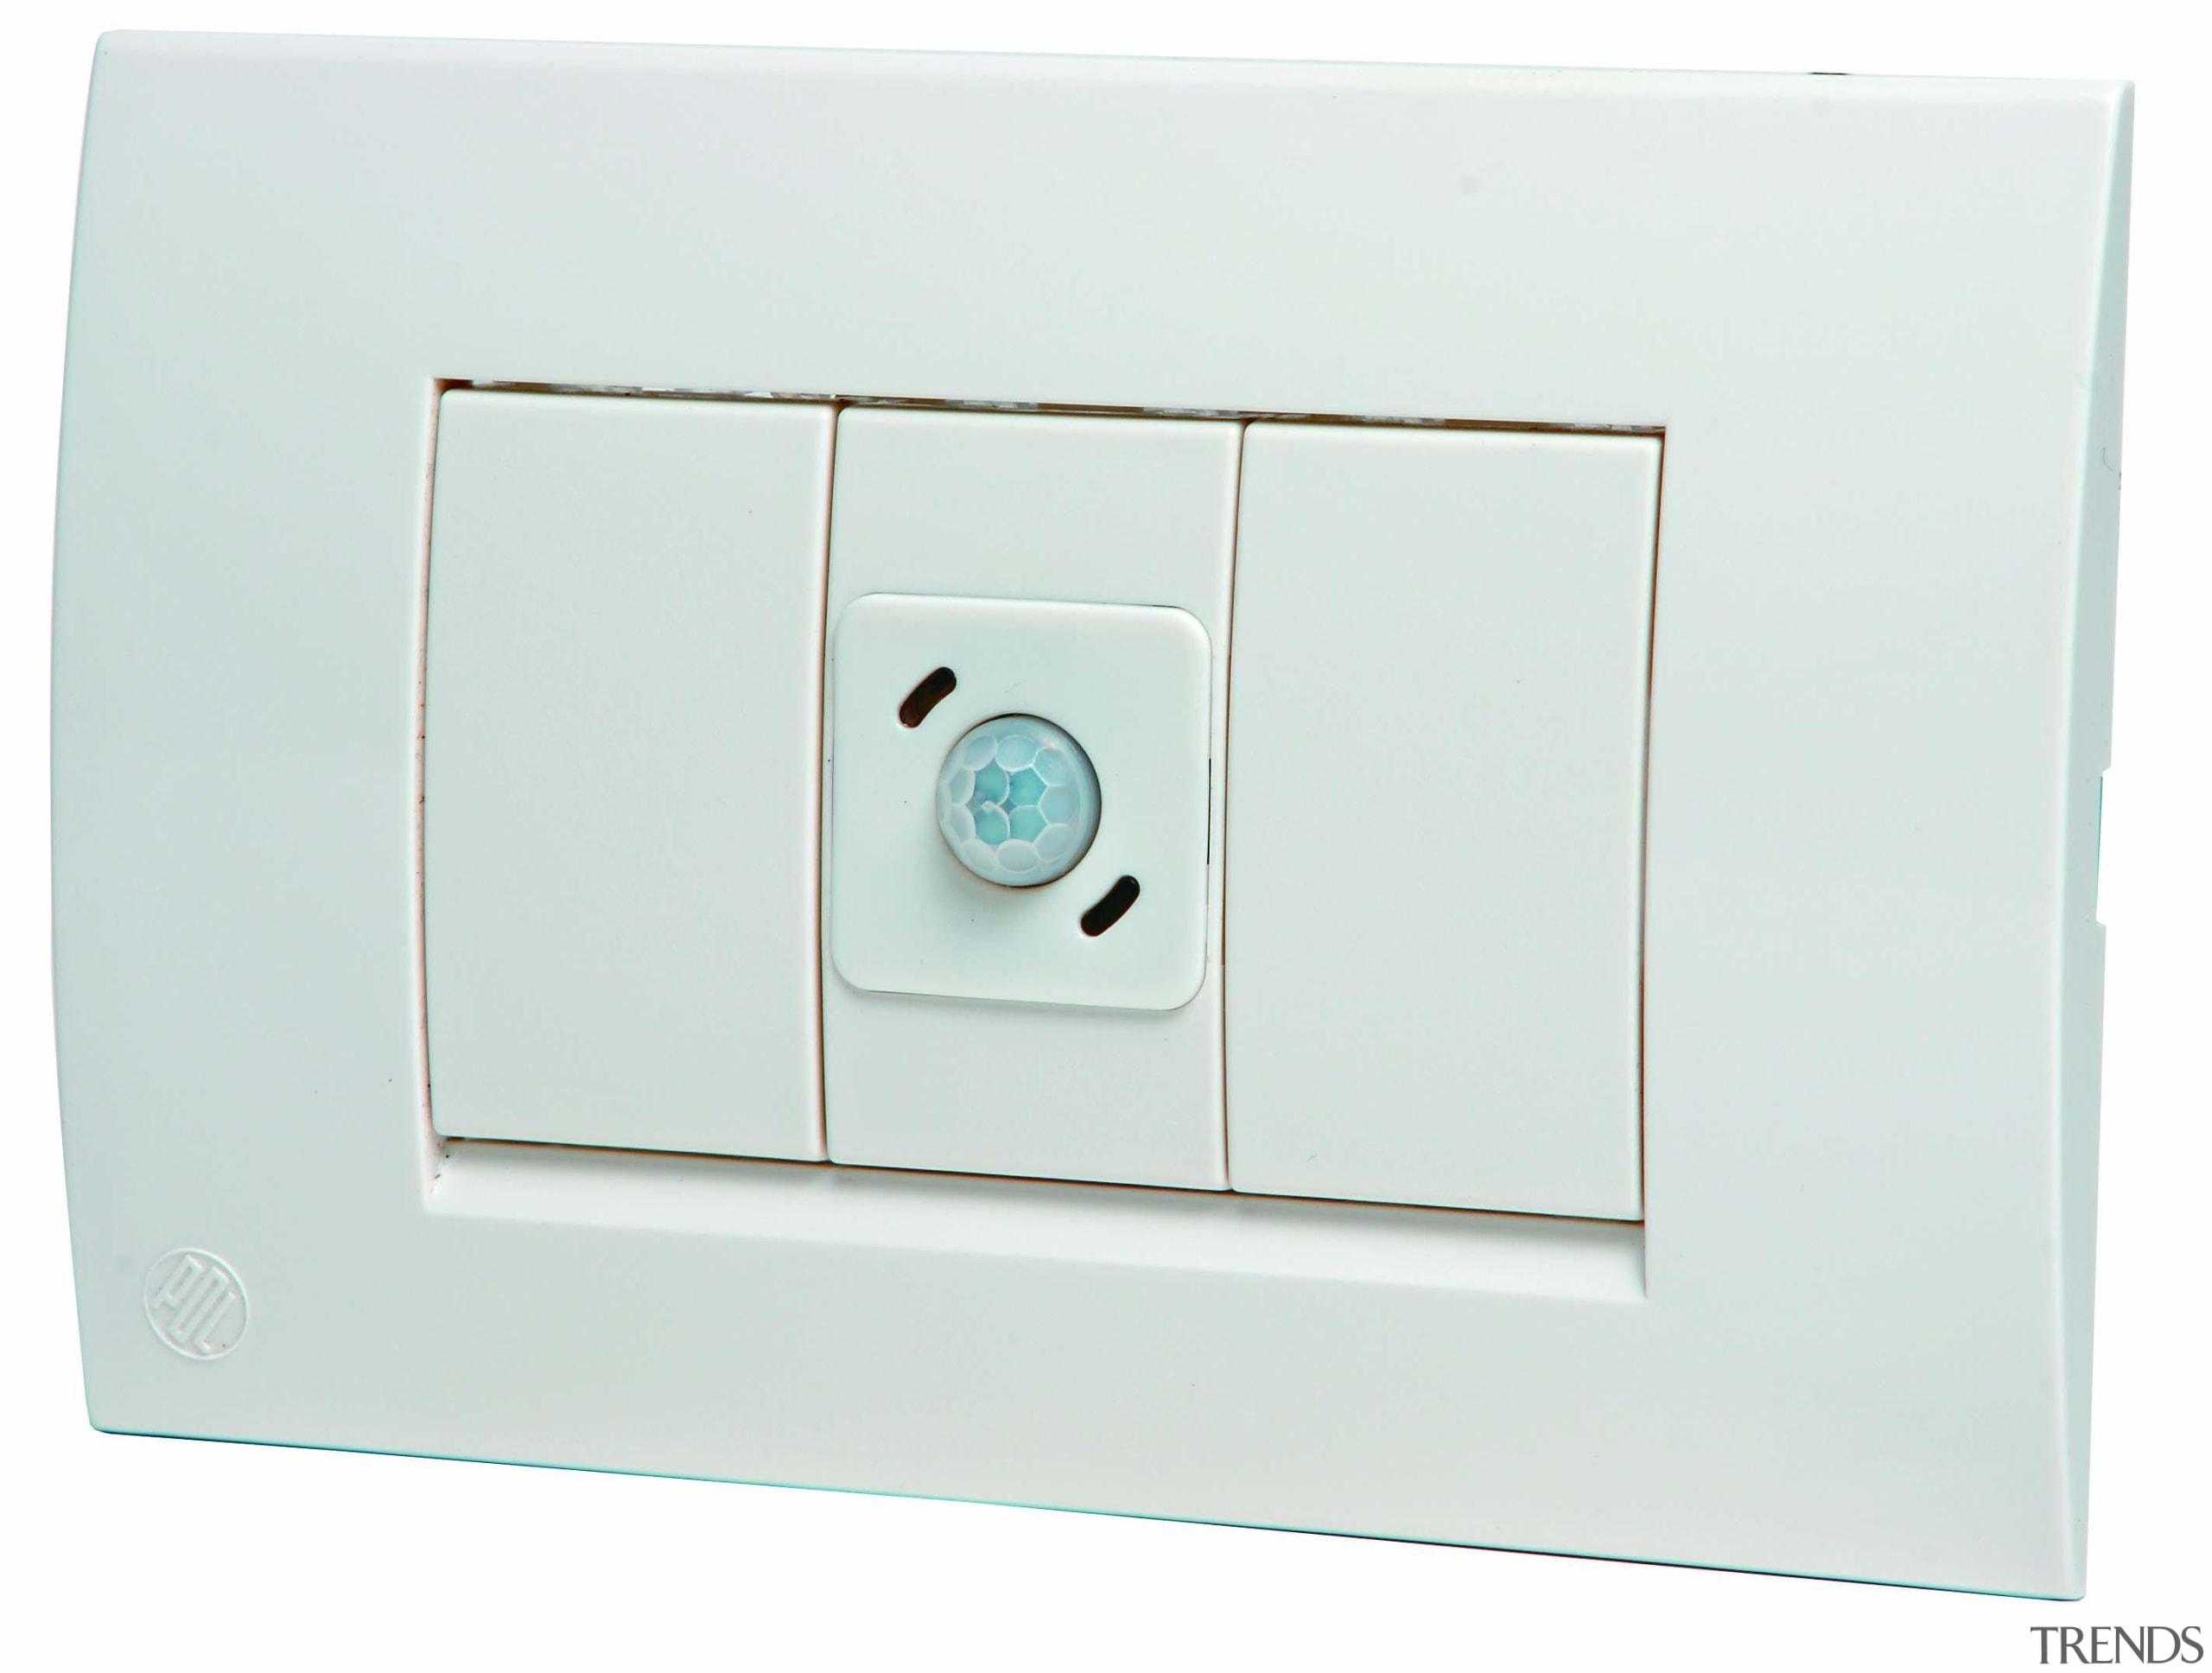 Modena with occupancy sensor - White - Modena light switch, switch, technology, white